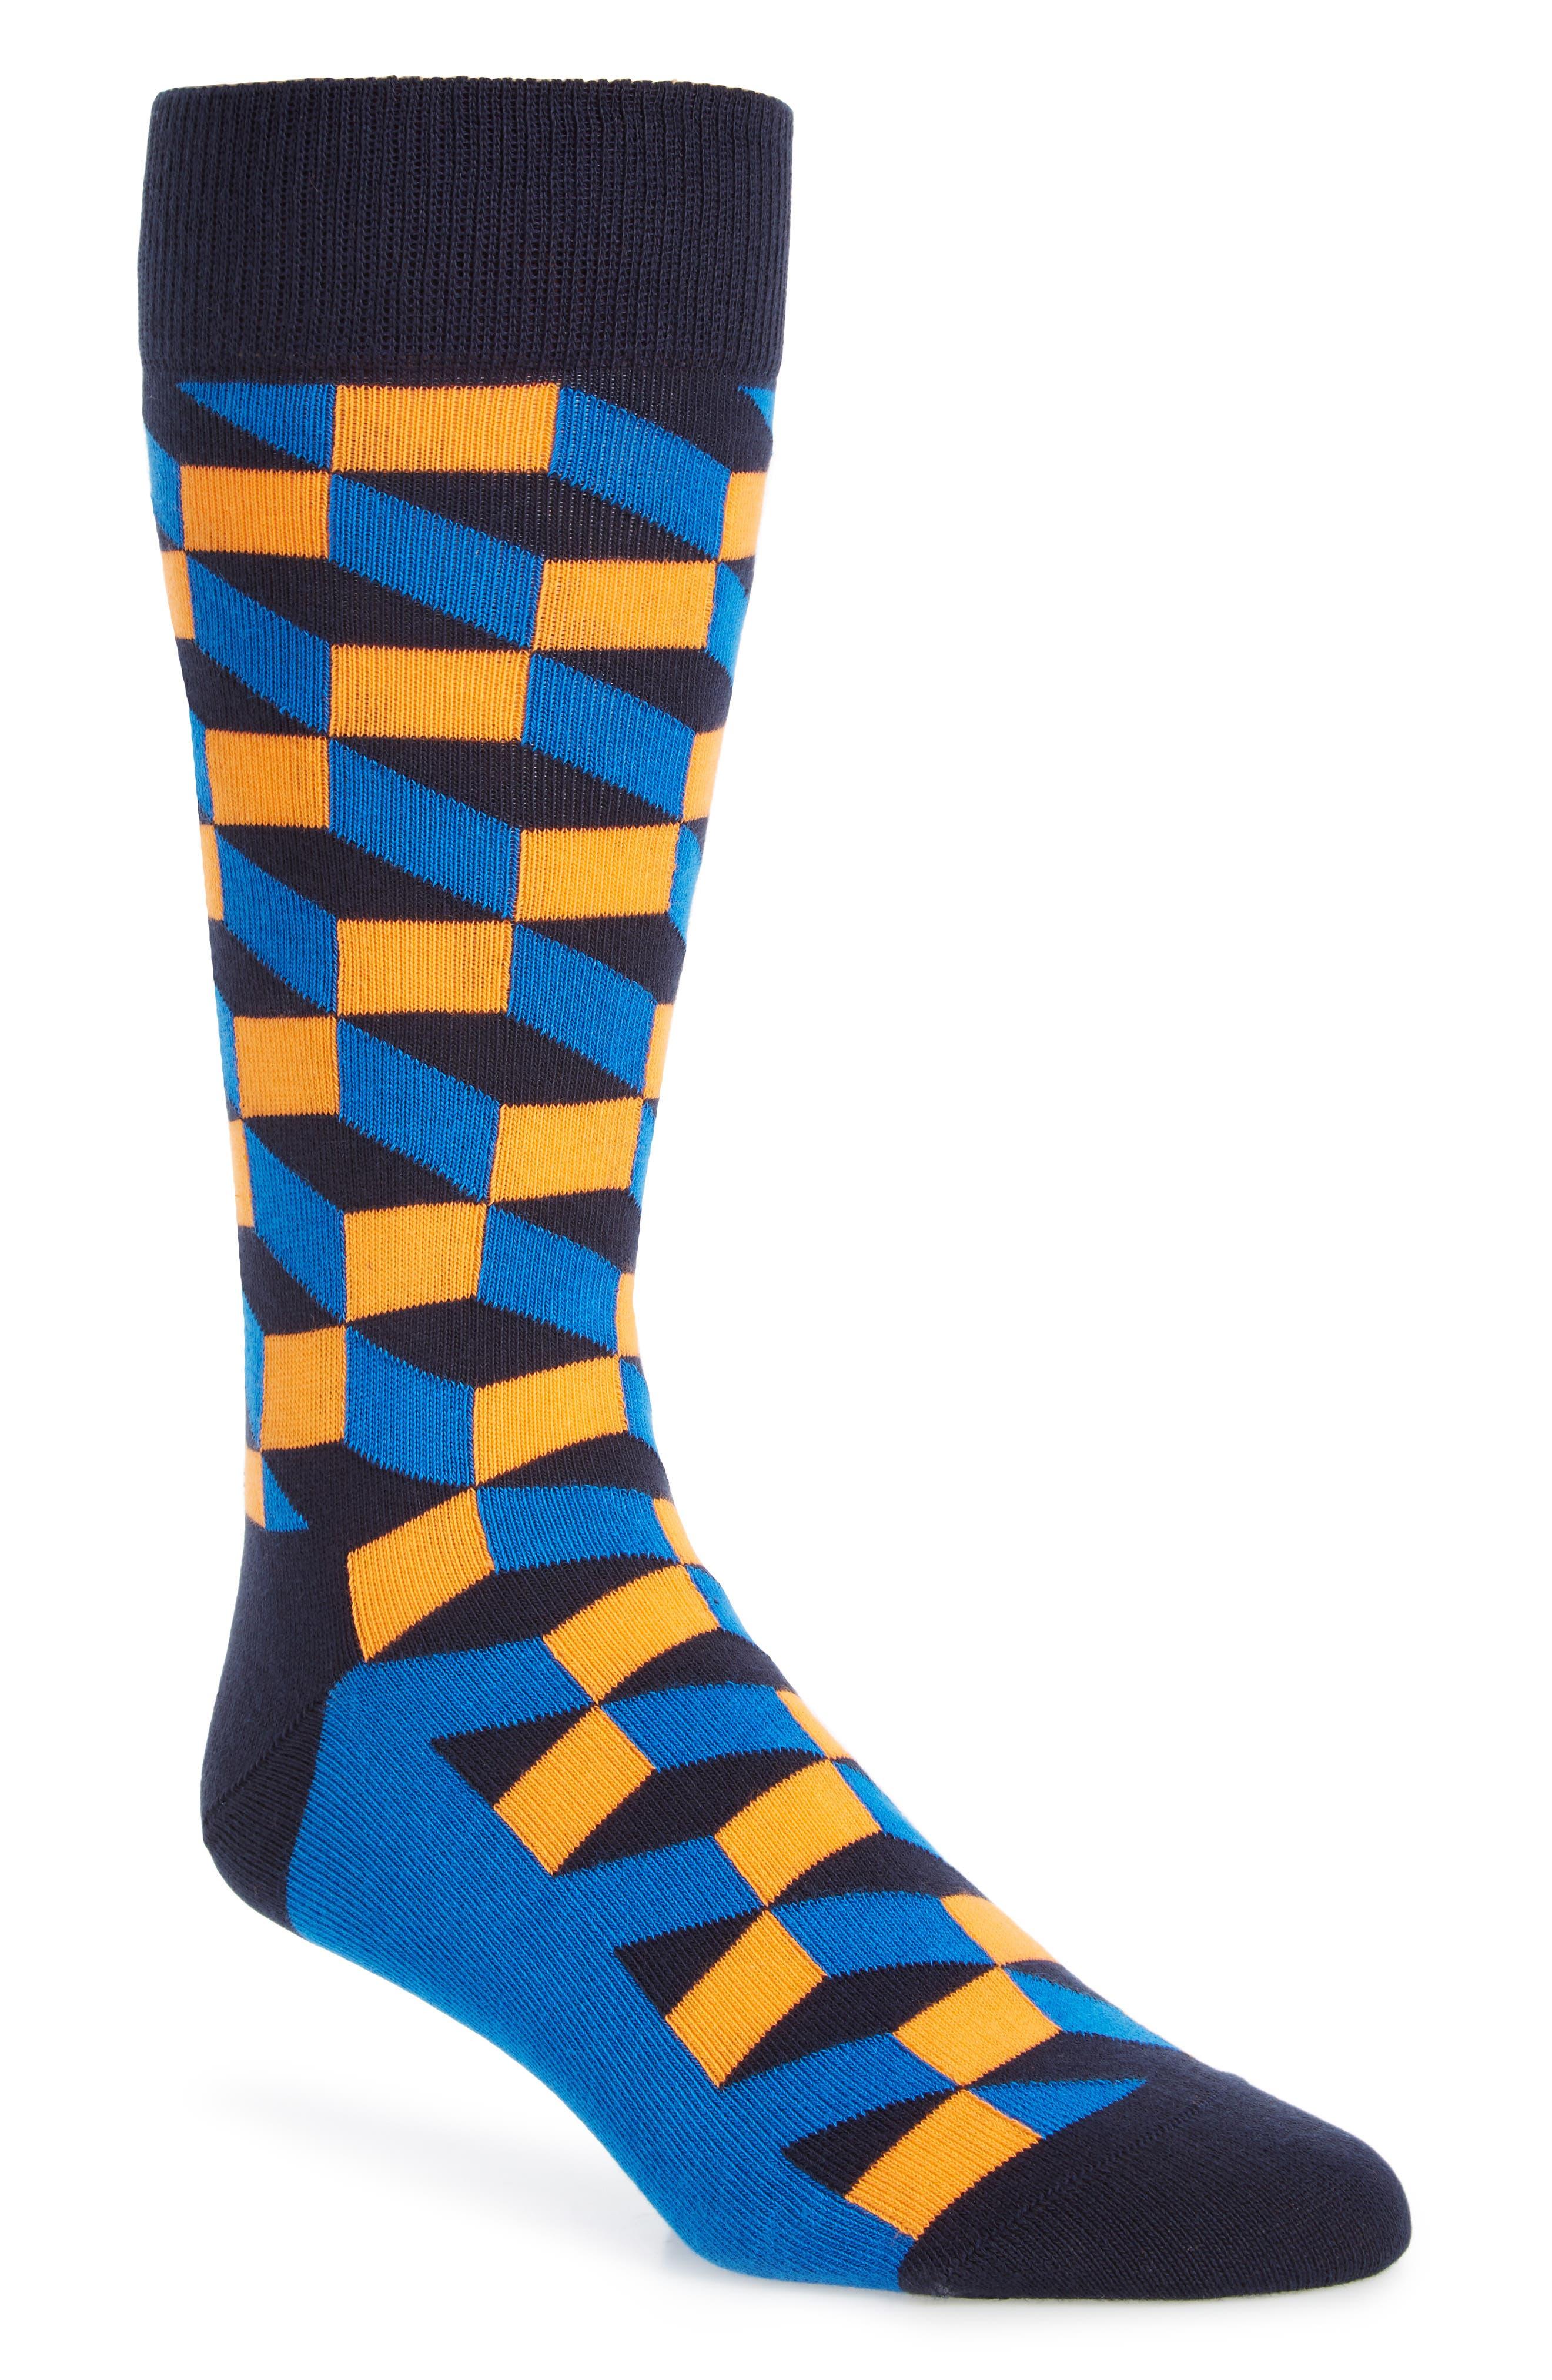 Optic Socks,                         Main,                         color, Black Multi